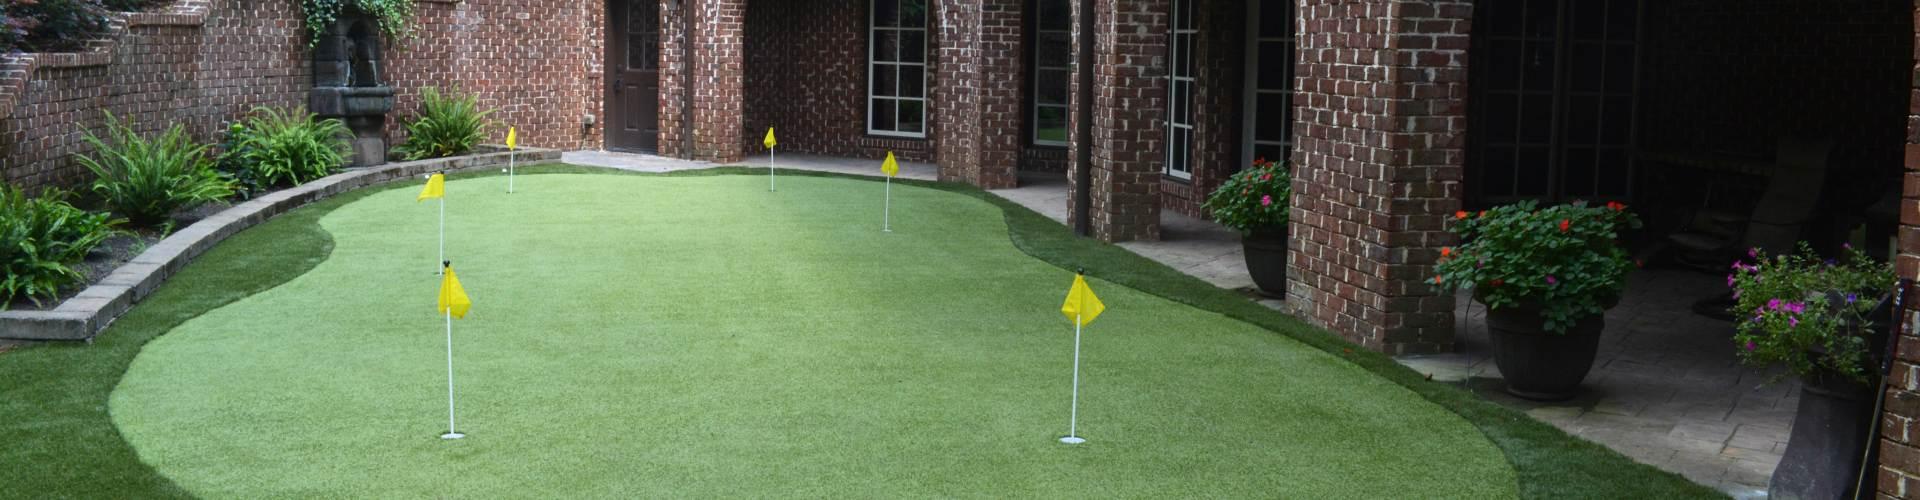 Backyard Putting Green Cost, Putting Green In Garden Cost